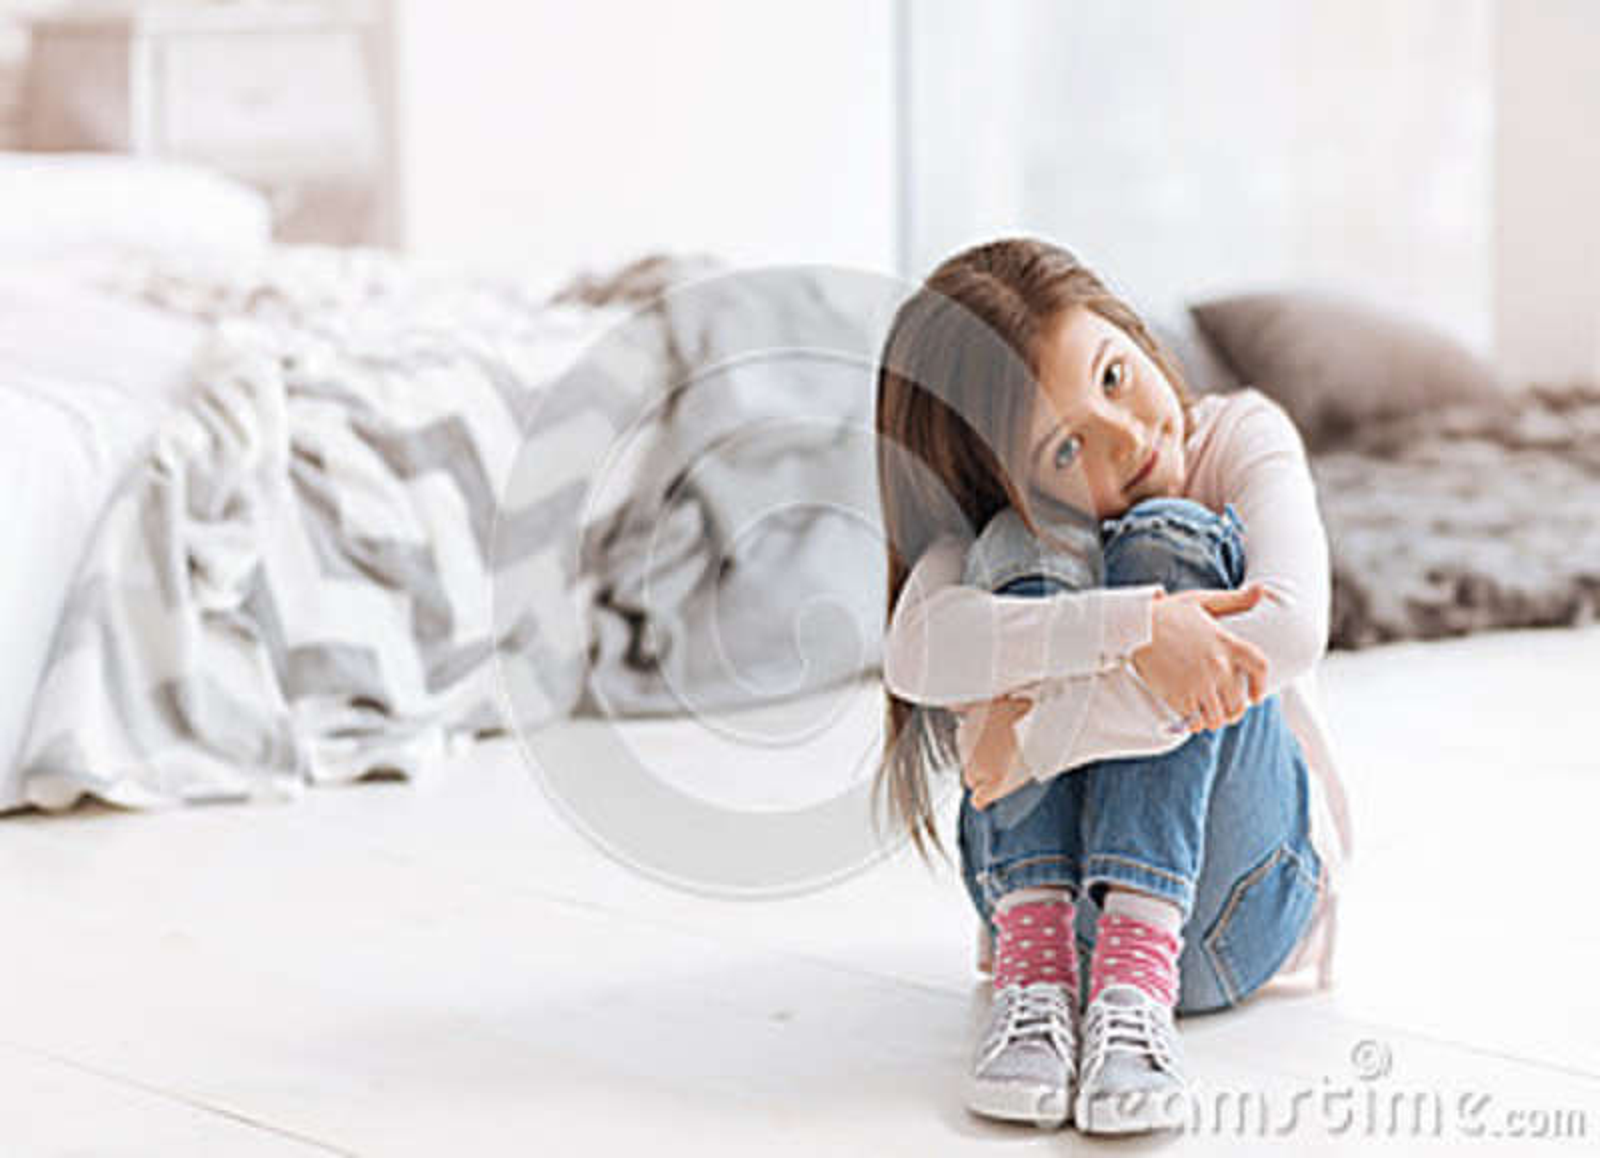 Pleasant cute girl sitting on the floor